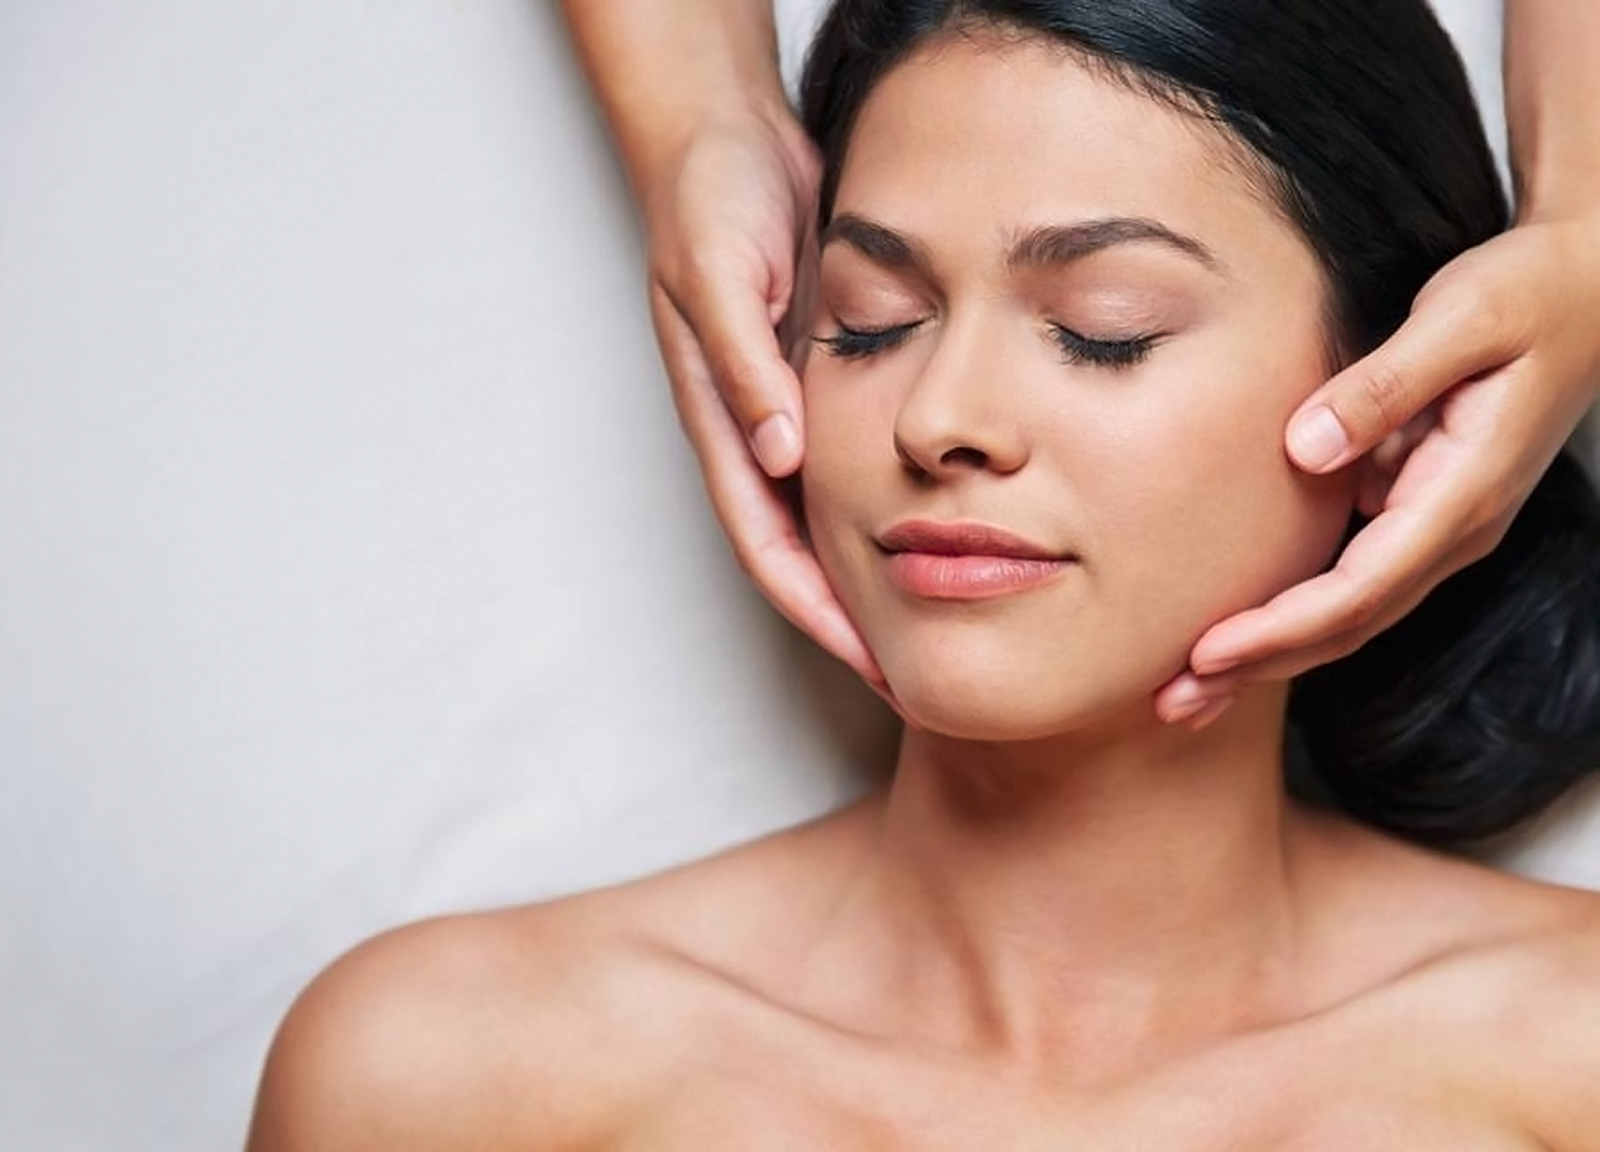 Woman with eyes closed enjoying a facial treatment at the Four Seasons LA spa.